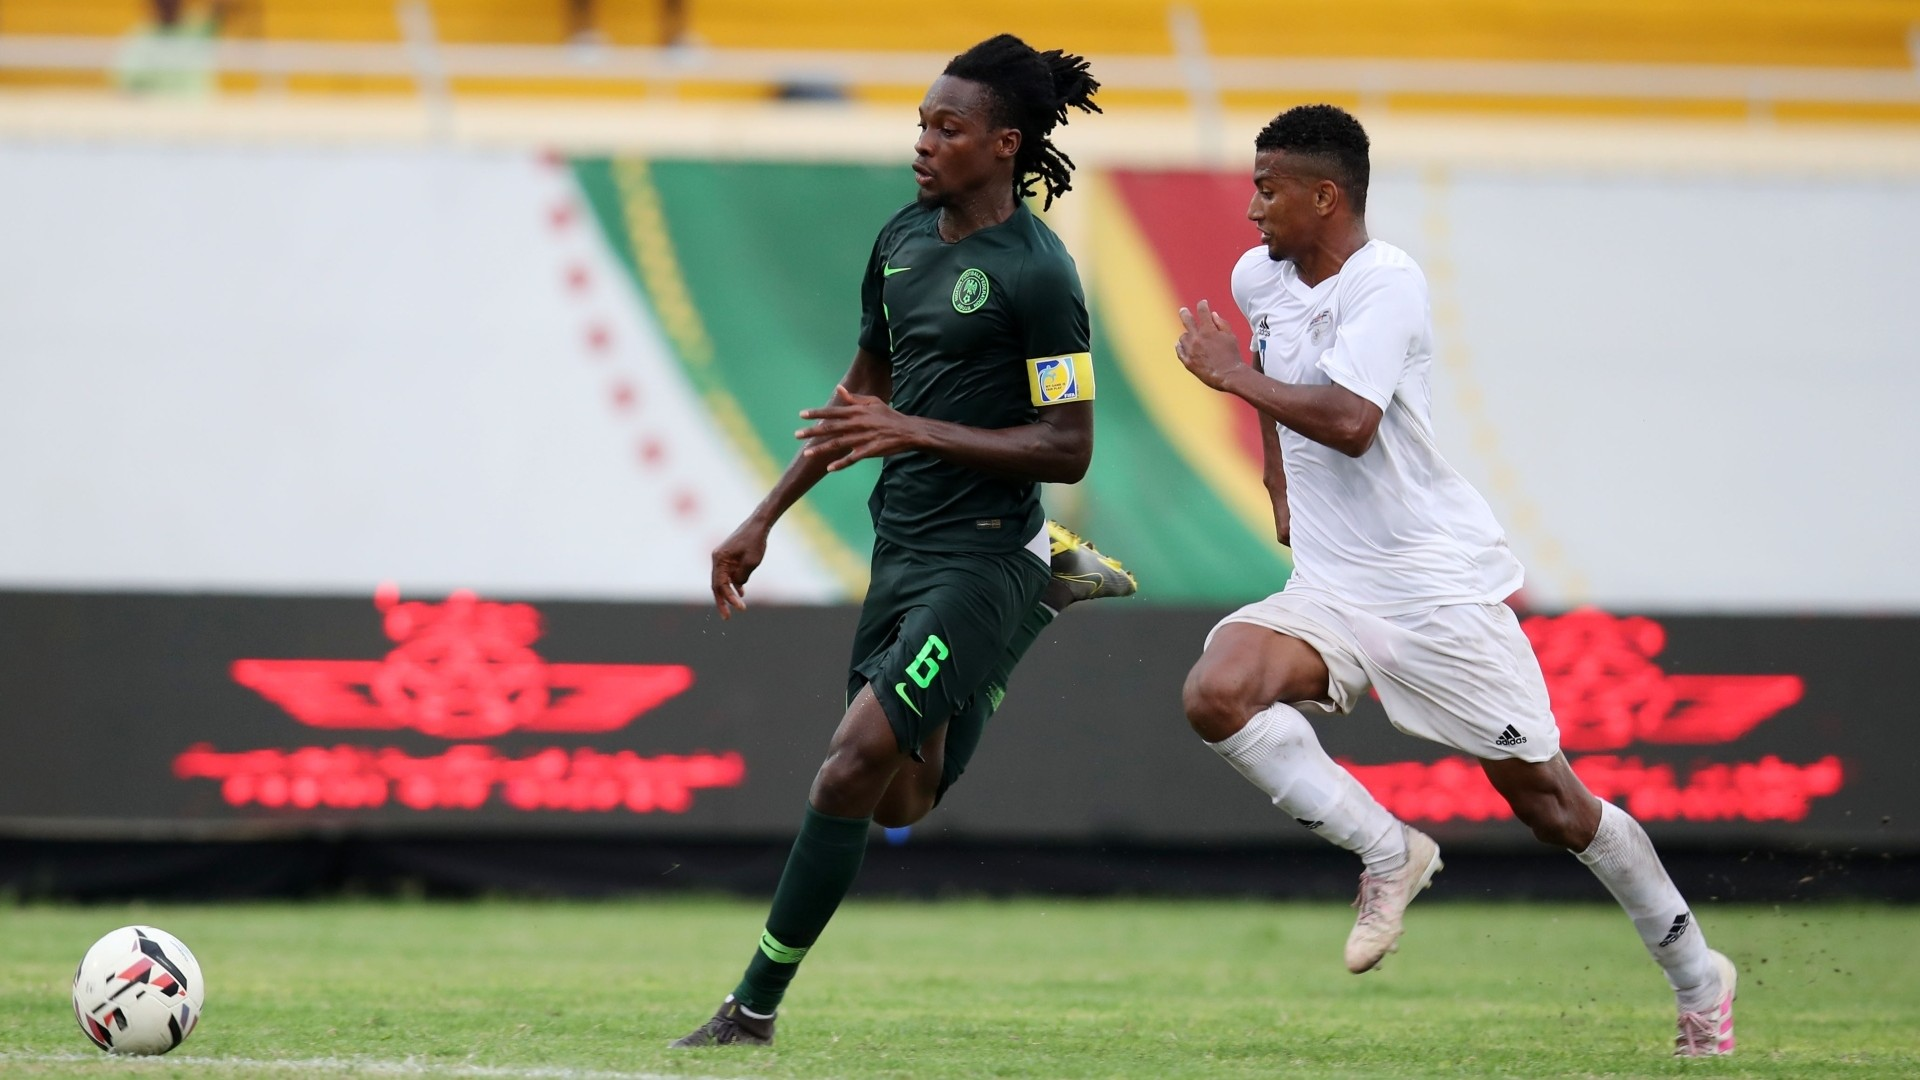 Ndah: Nigeria international on trial at Orlando Pirates after helping Akwa United clinch NPFL title